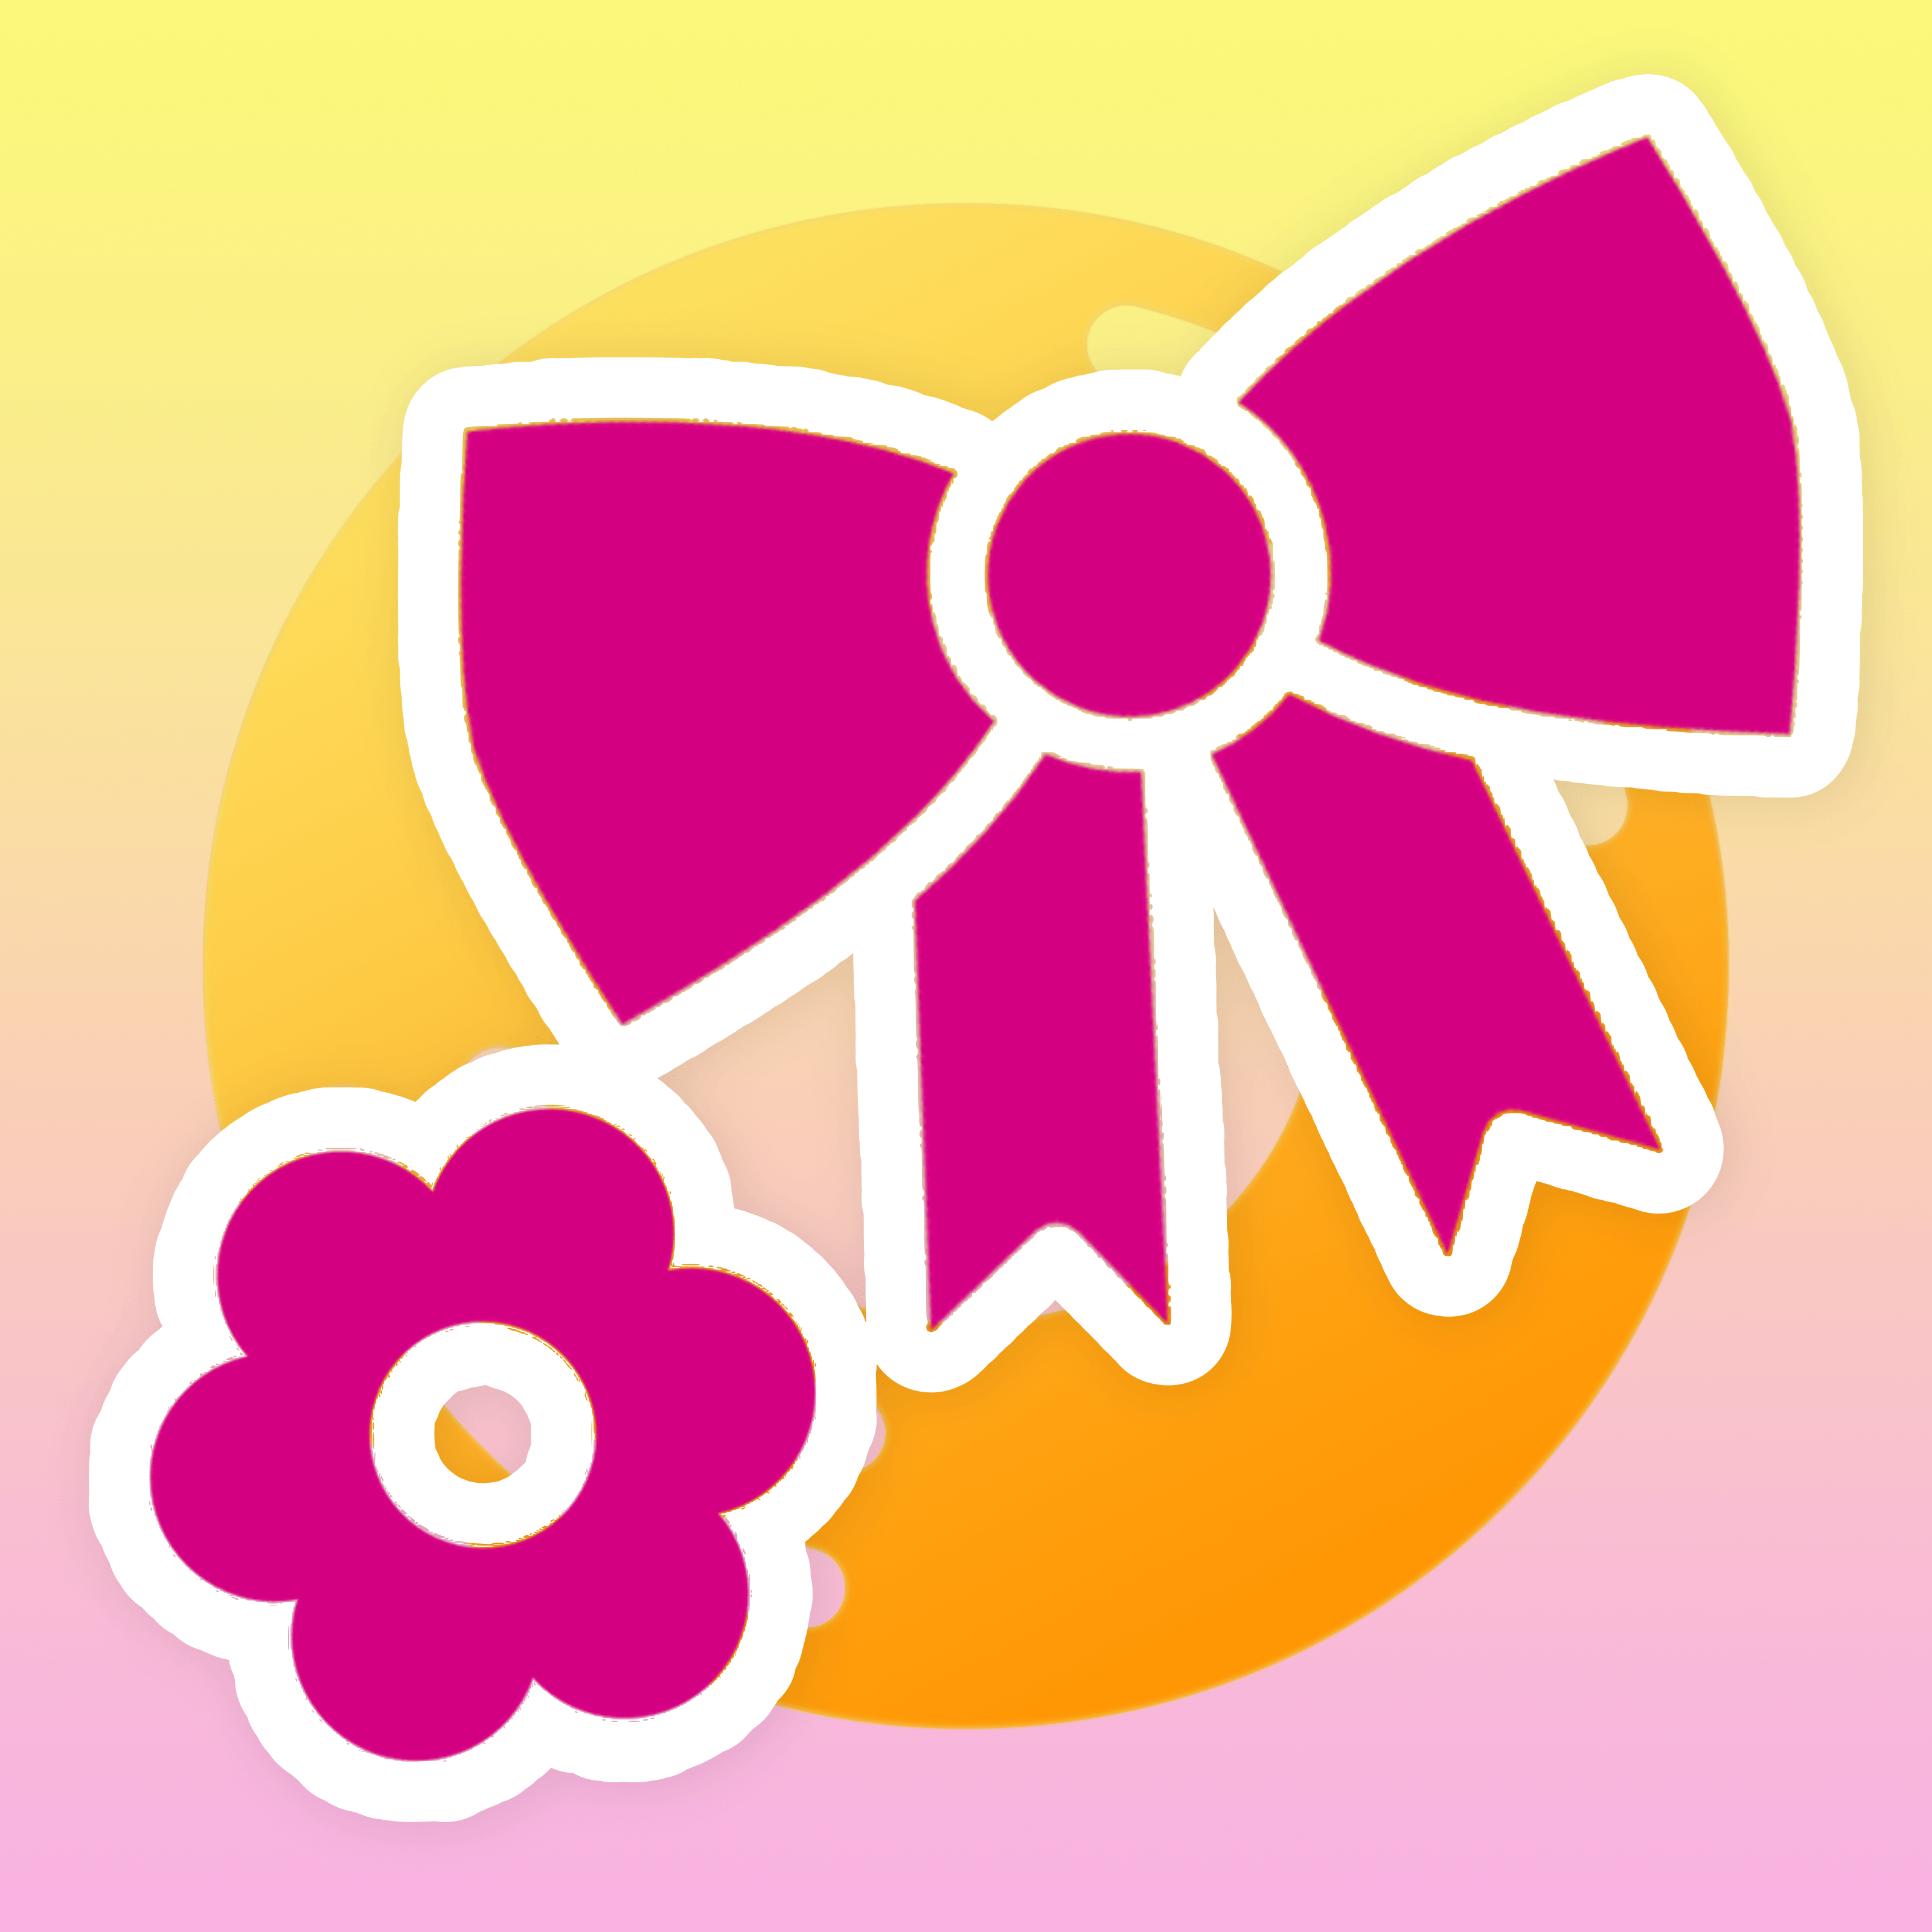 sbuboletta avatar